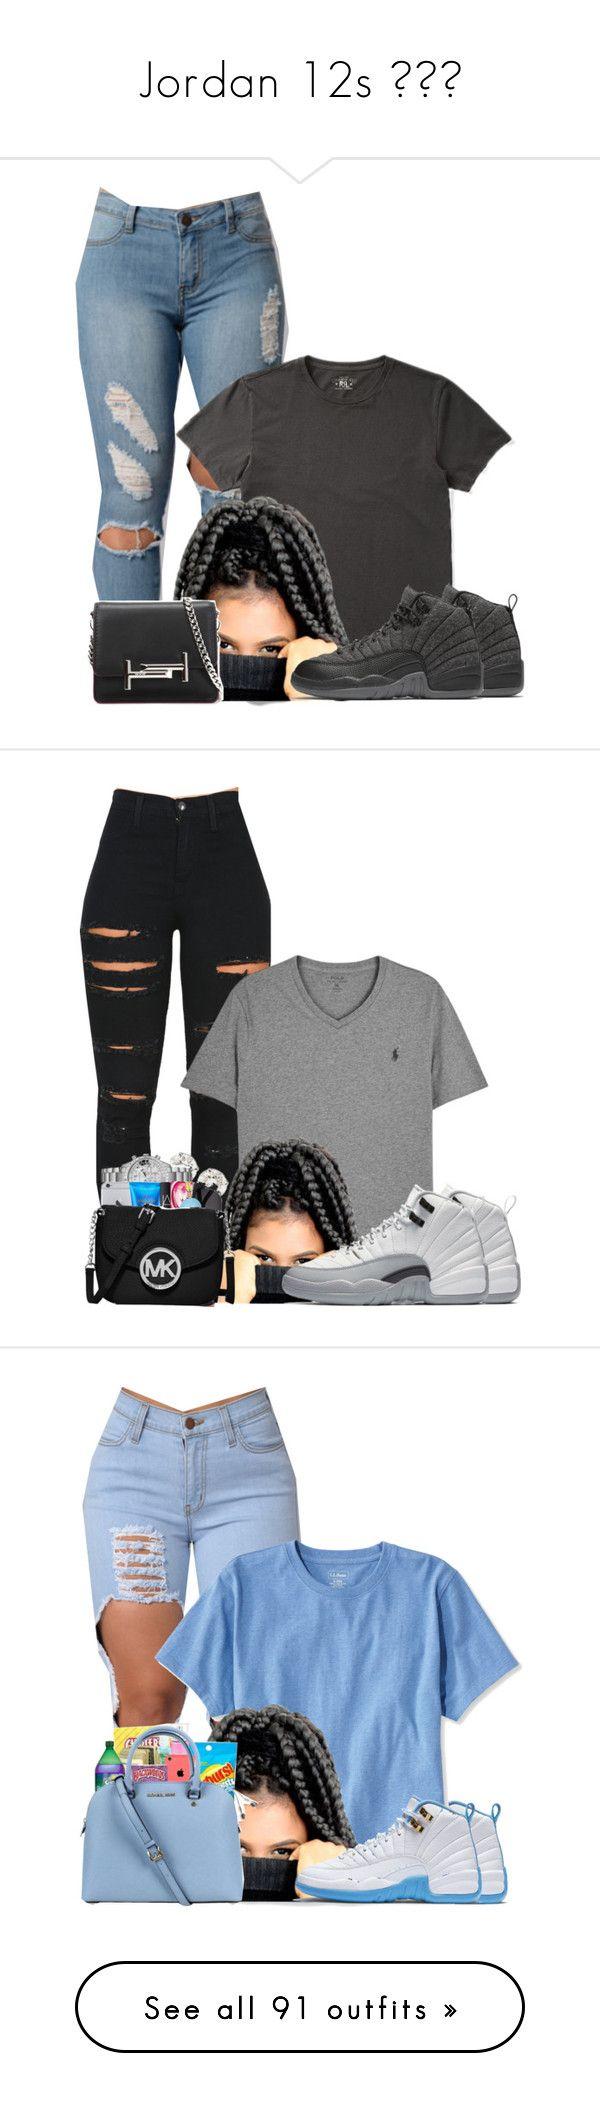 Jordan 12s by prinxcess-adri ❤ liked on Polyvore featuring Ralph Lauren, NIKE, Tod's, Vibrant, Polo Ralph Lauren, L.L.Bean, ban.do, MCM, Retrò and MICHAEL Michael Kors